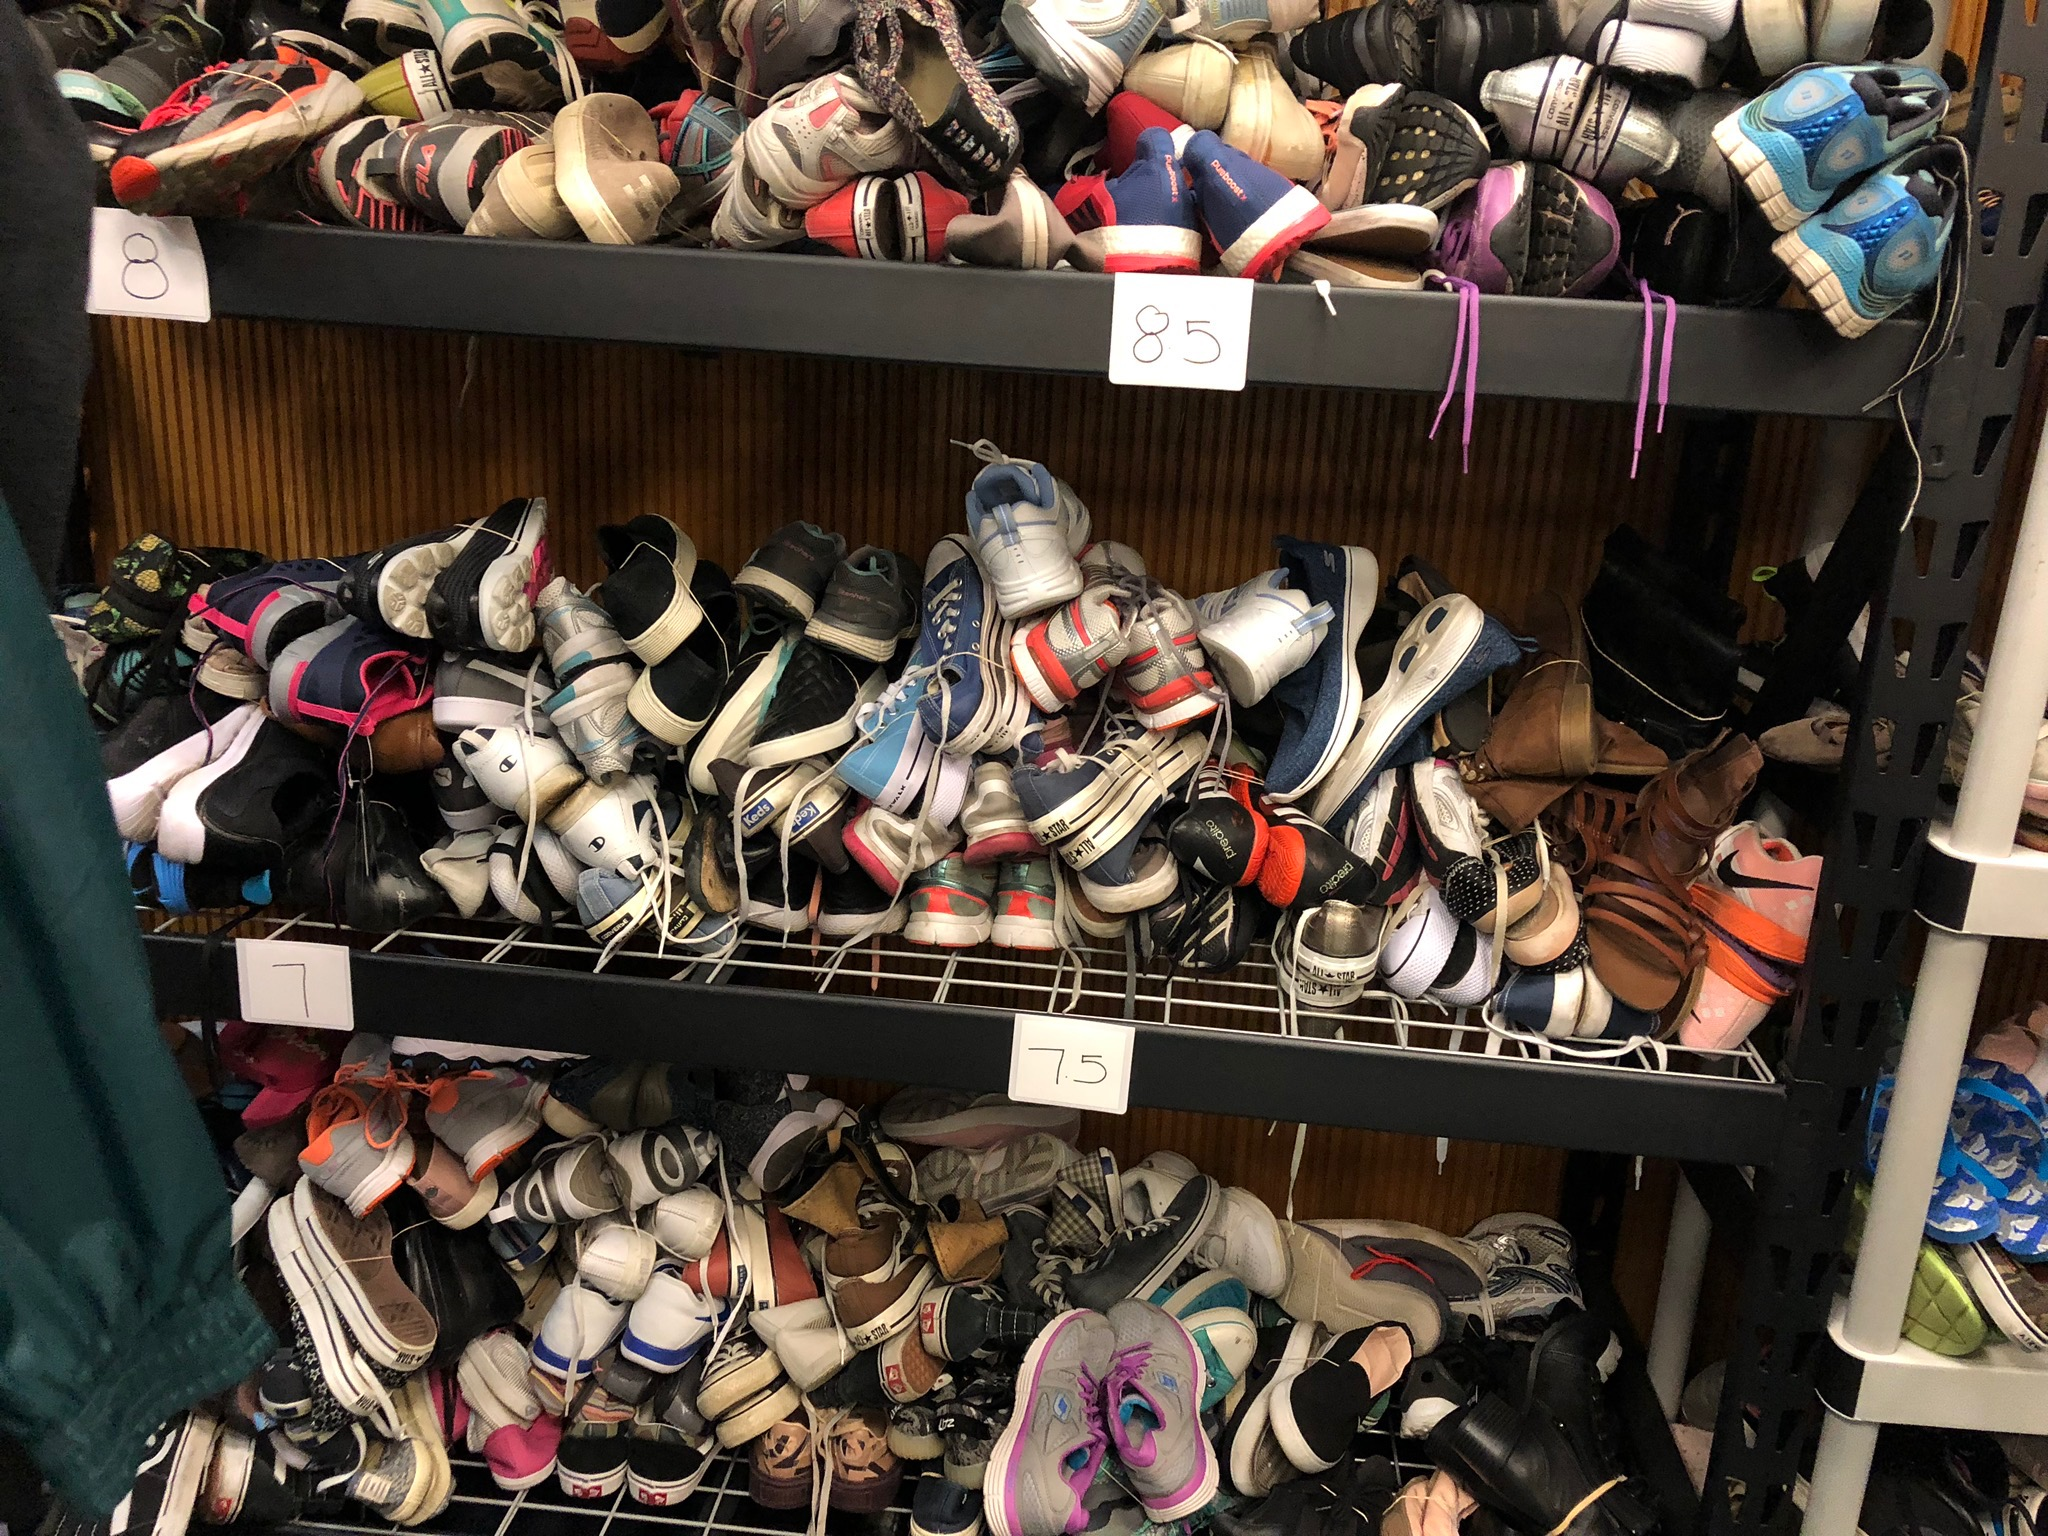 Shoe donations at JFS San Diego